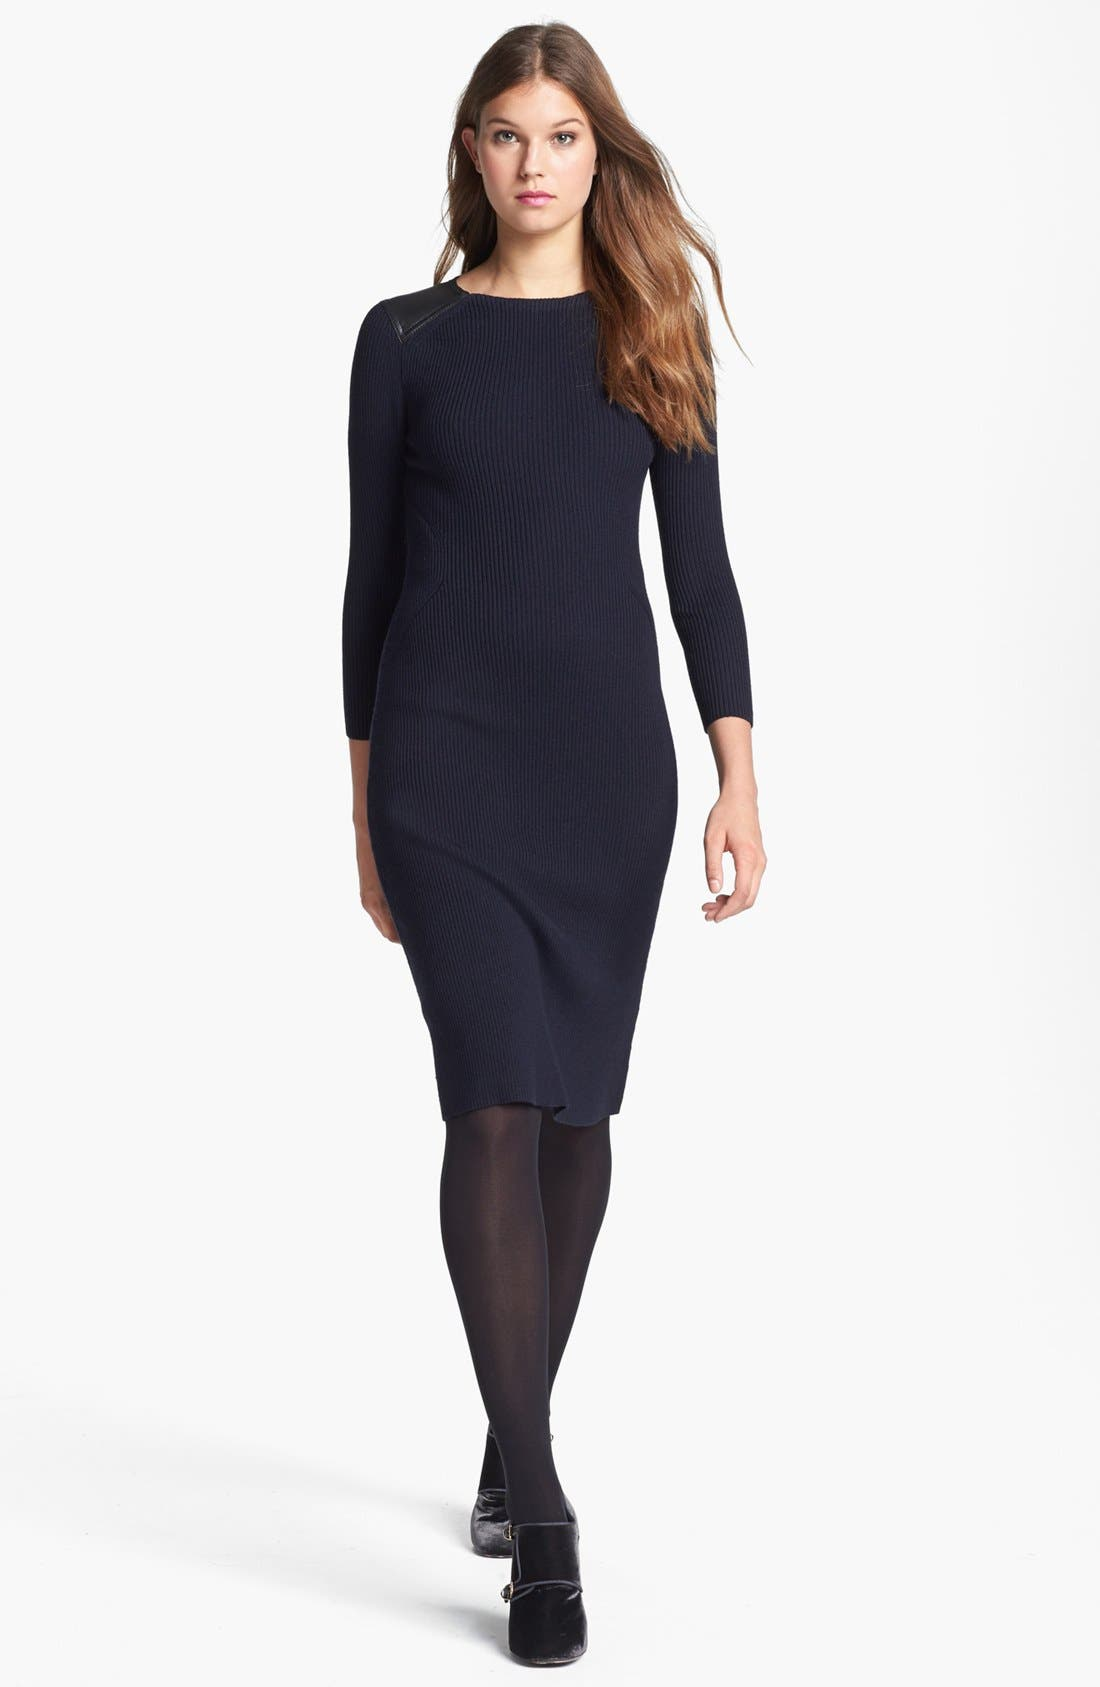 Alternate Image 1 Selected - Tory Burch 'Courtney' Merino Wool Blend Sweater Dress